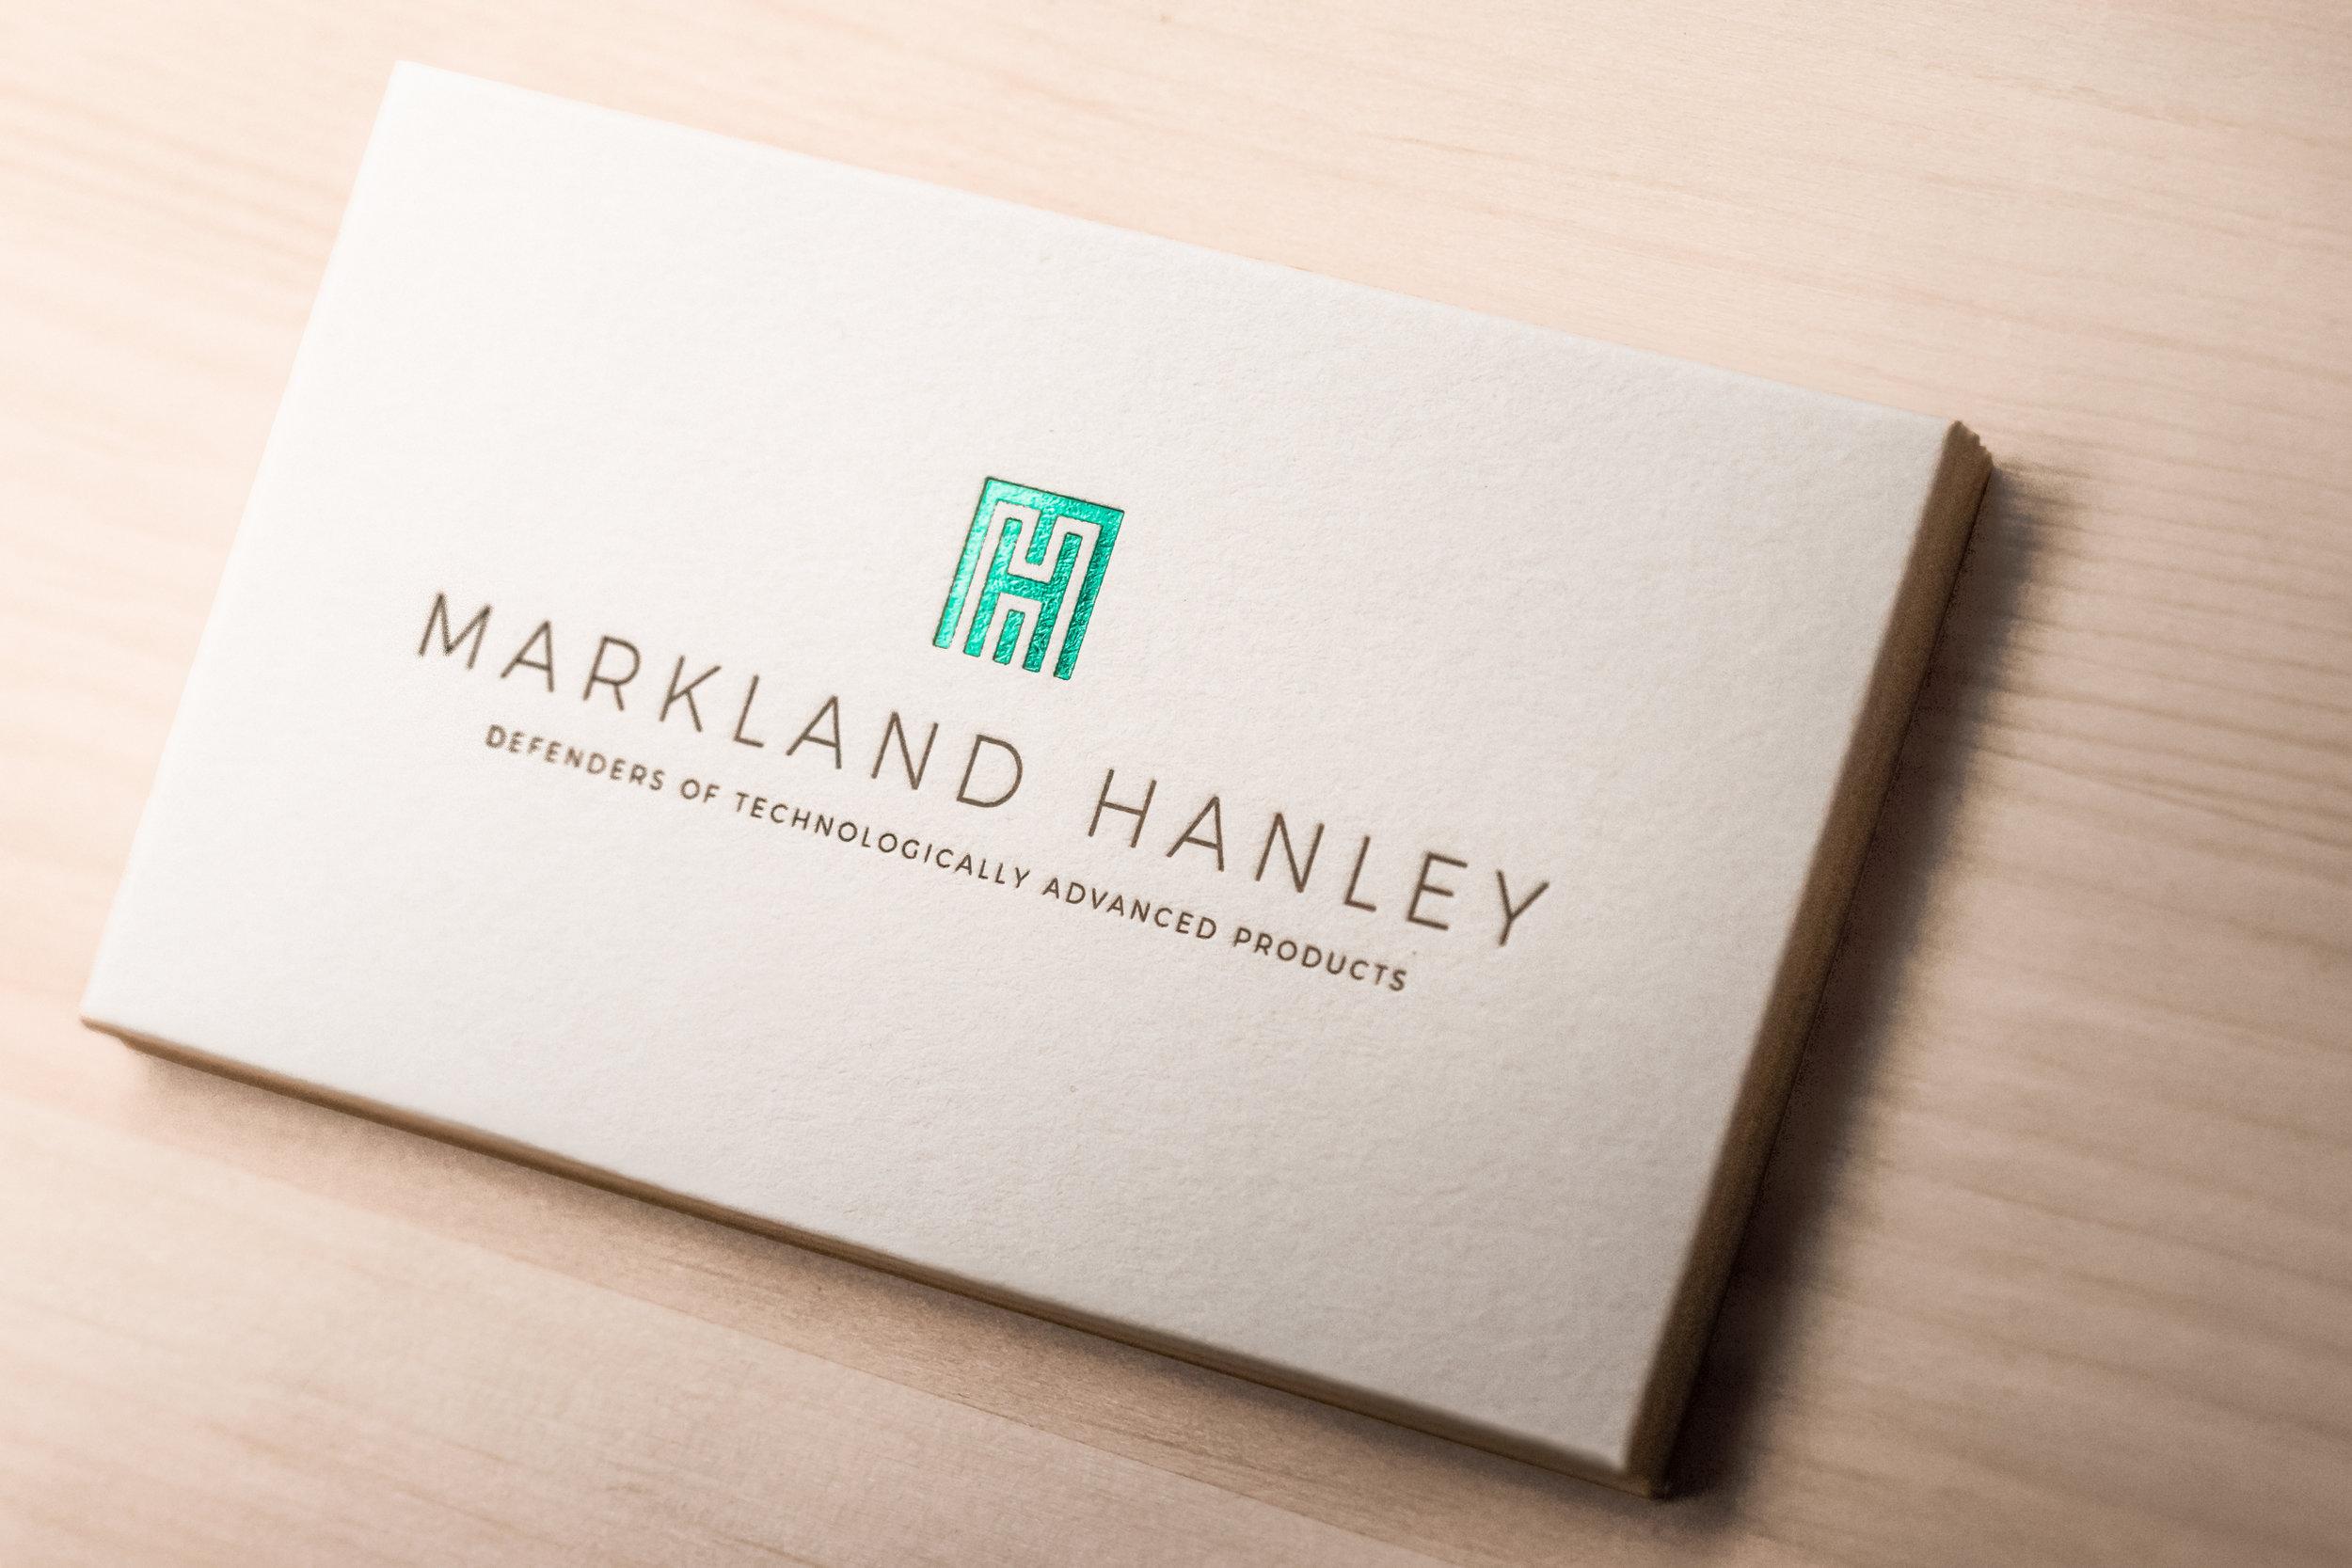 Marland_Hanley_Stationary-5.jpg